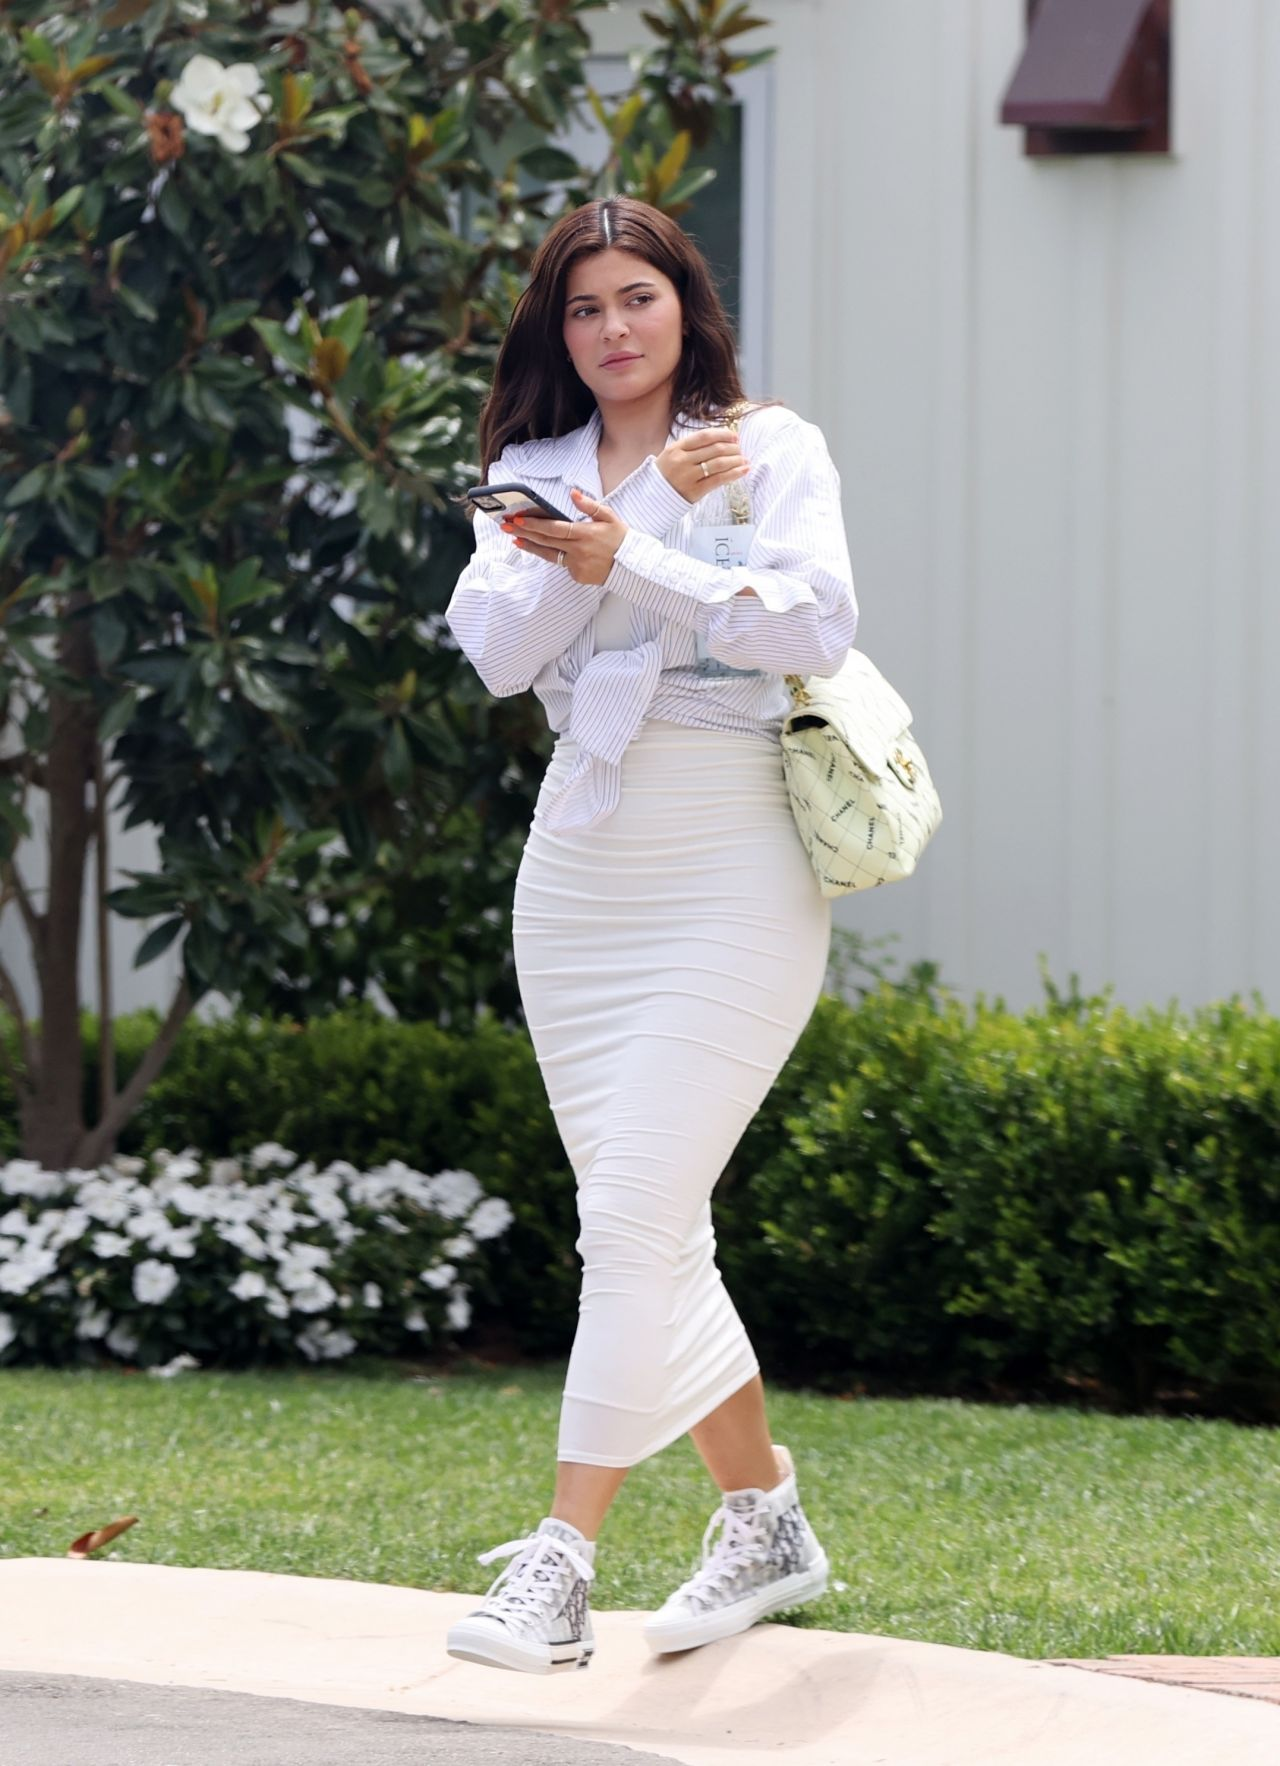 Kylie Jenner Fashion Style Laguna Beach July 19 2020 Fashionsizzle